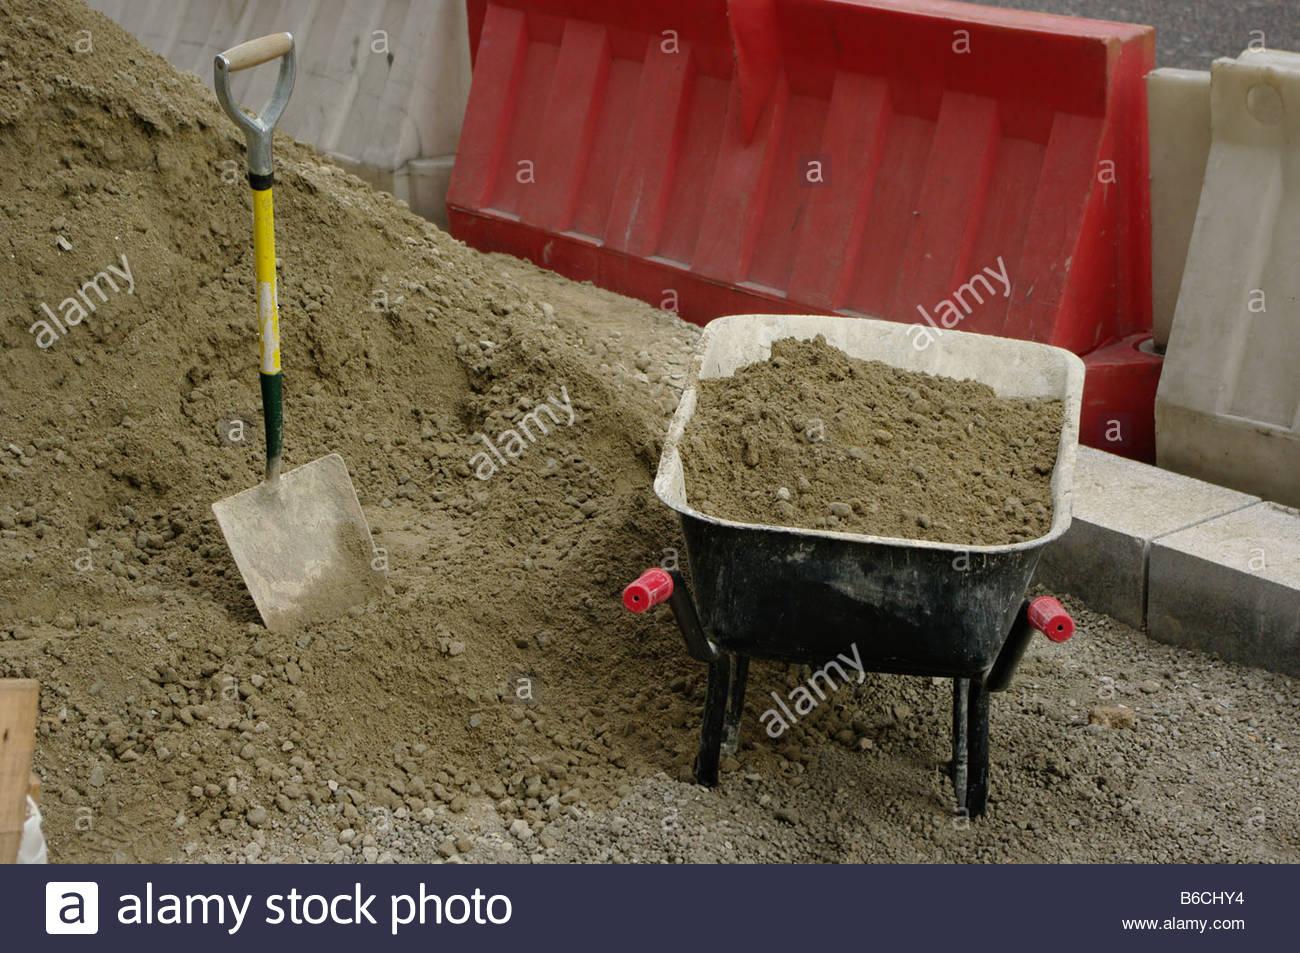 Shovel spade wheelbarrow sand London England Street road building digging hole construction tool tools Stock Photo